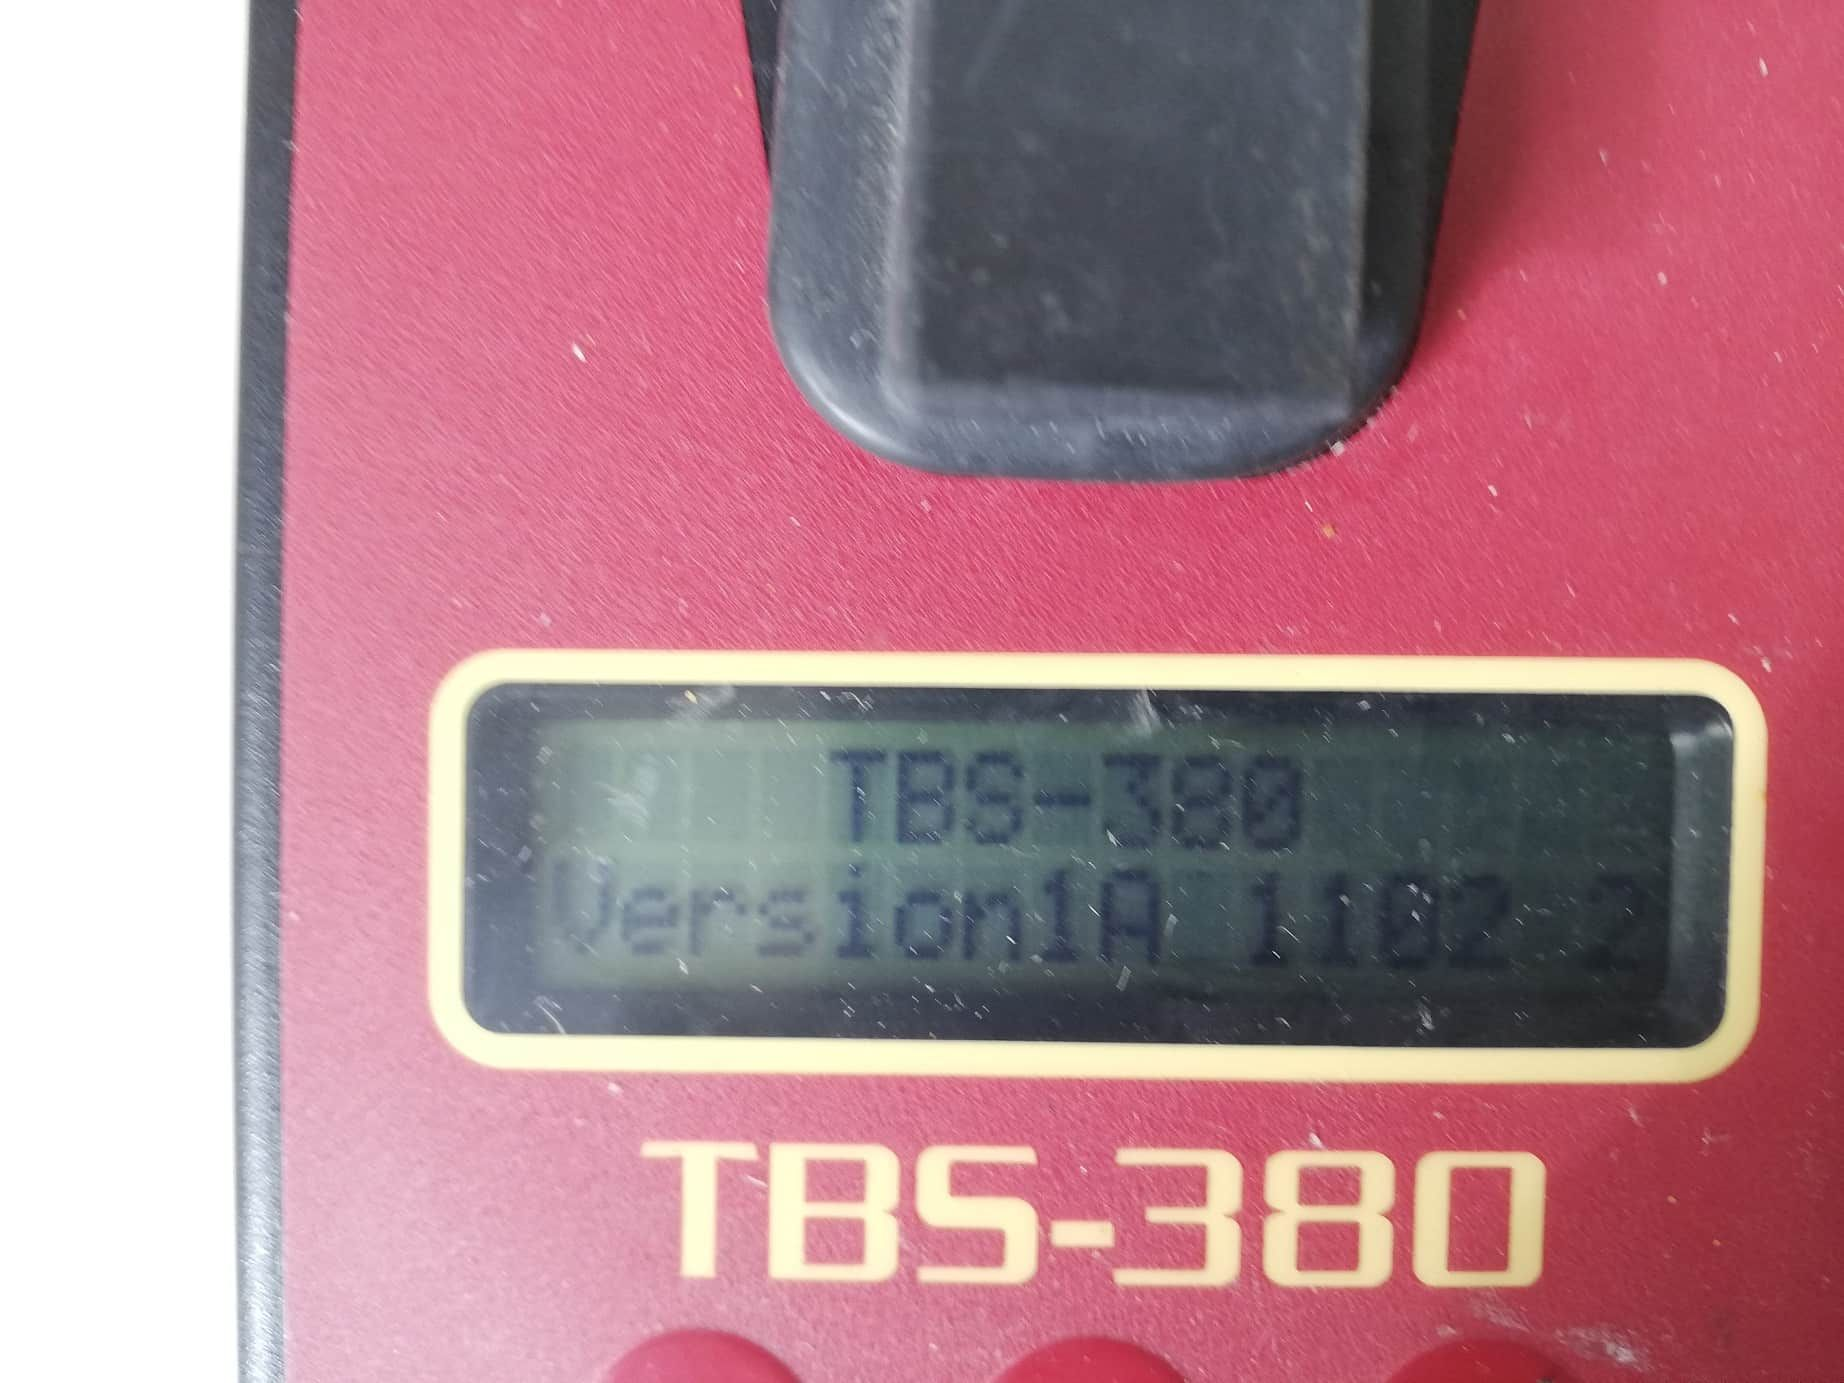 Turner Biosystems TBS-380 Fluorometer